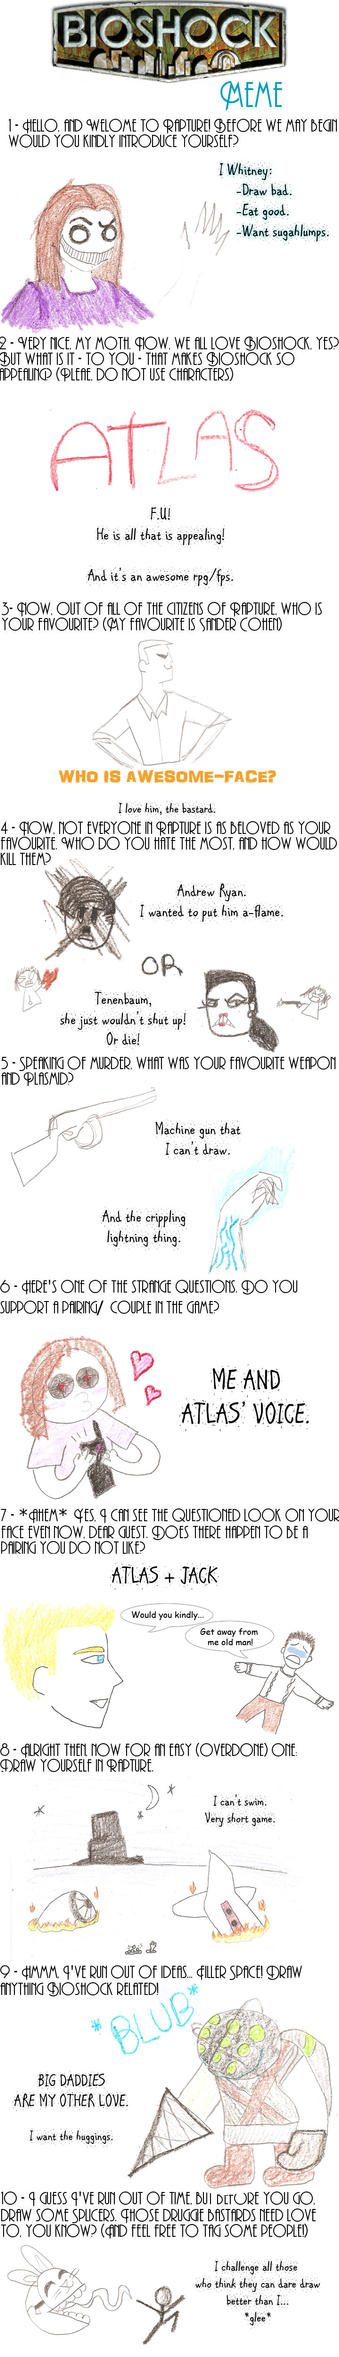 Bioshock Meme by Metal-Rath